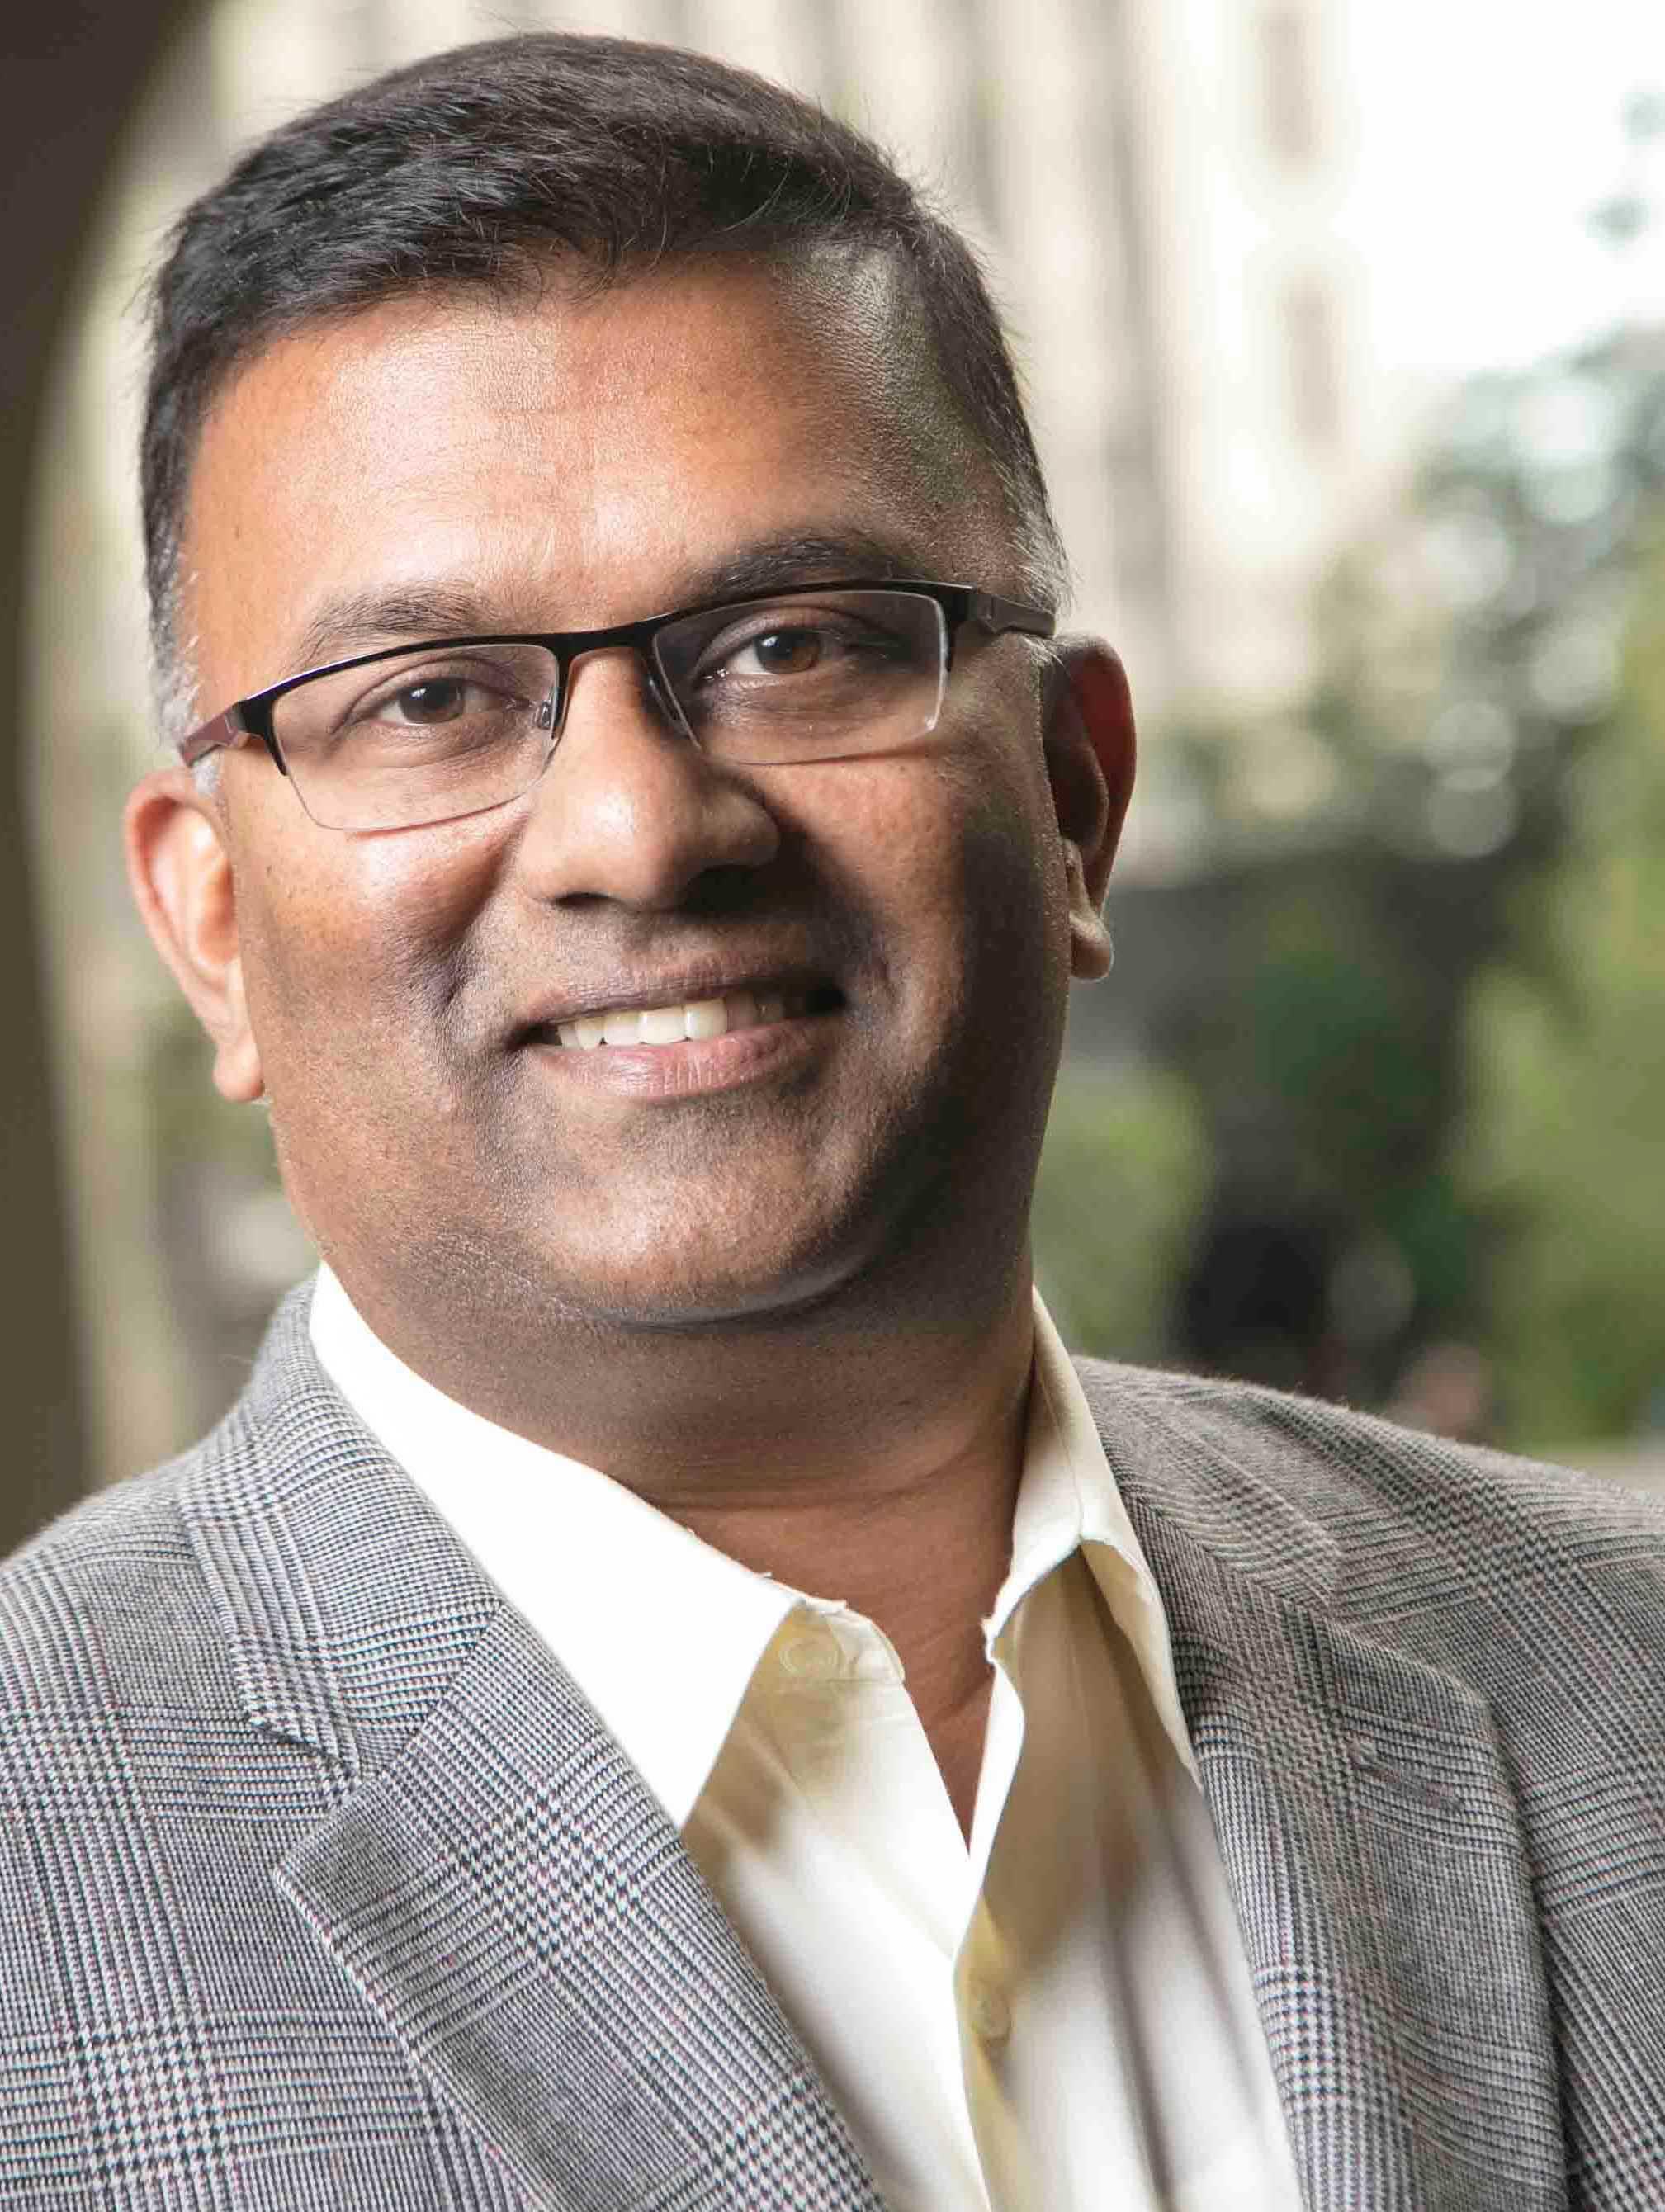 Berkeley EMBA student and GMAT podcast host Manoj Thomas